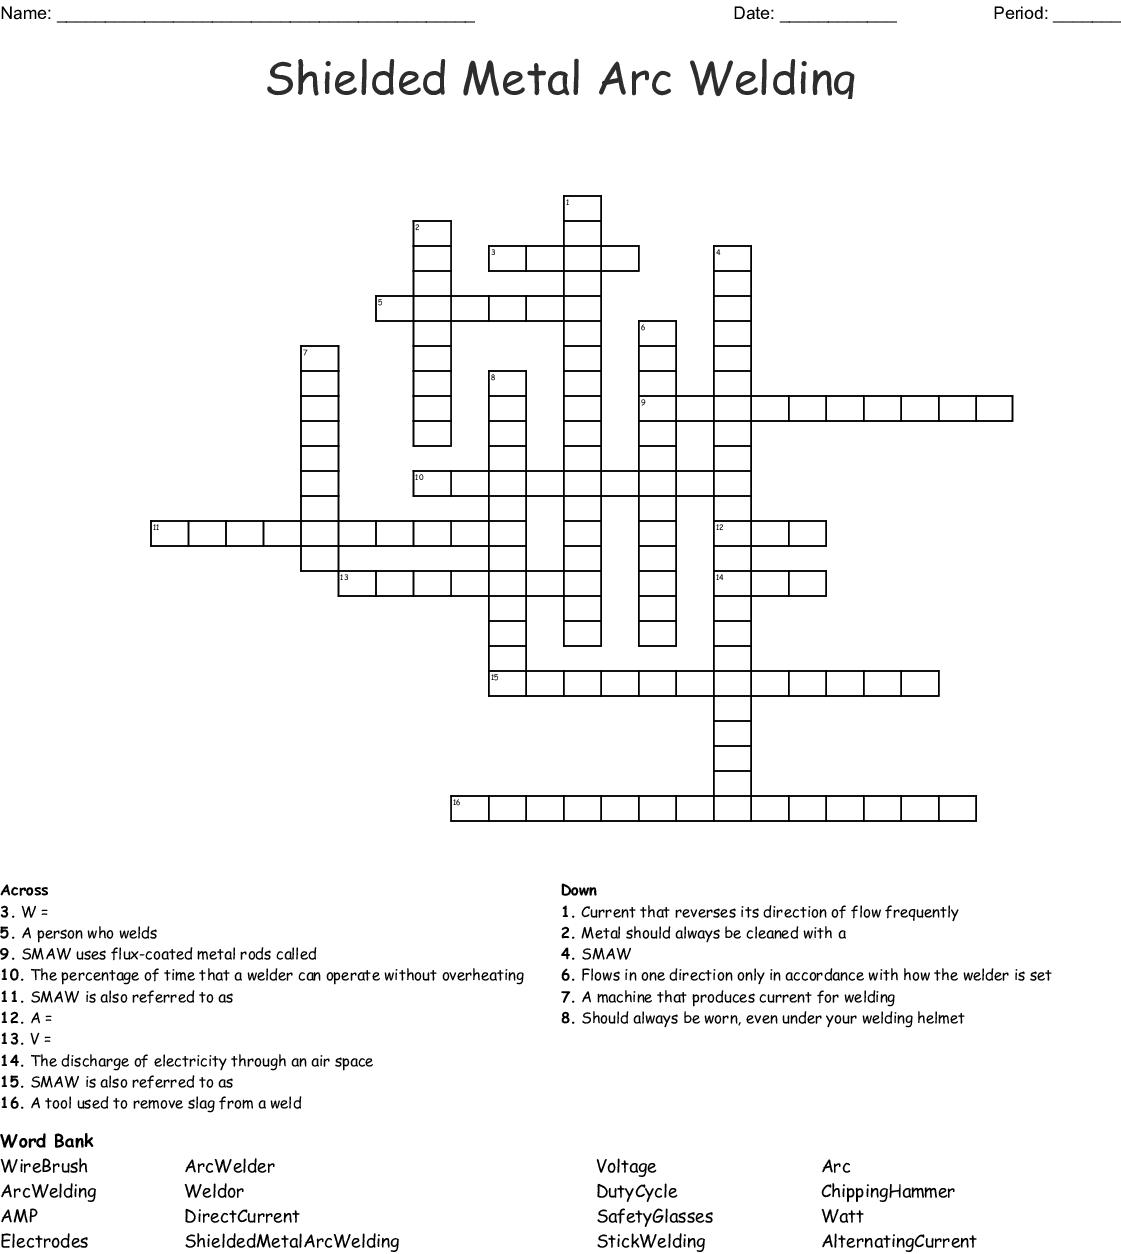 Shielded Metal Arc Welding Crossword Wordmint